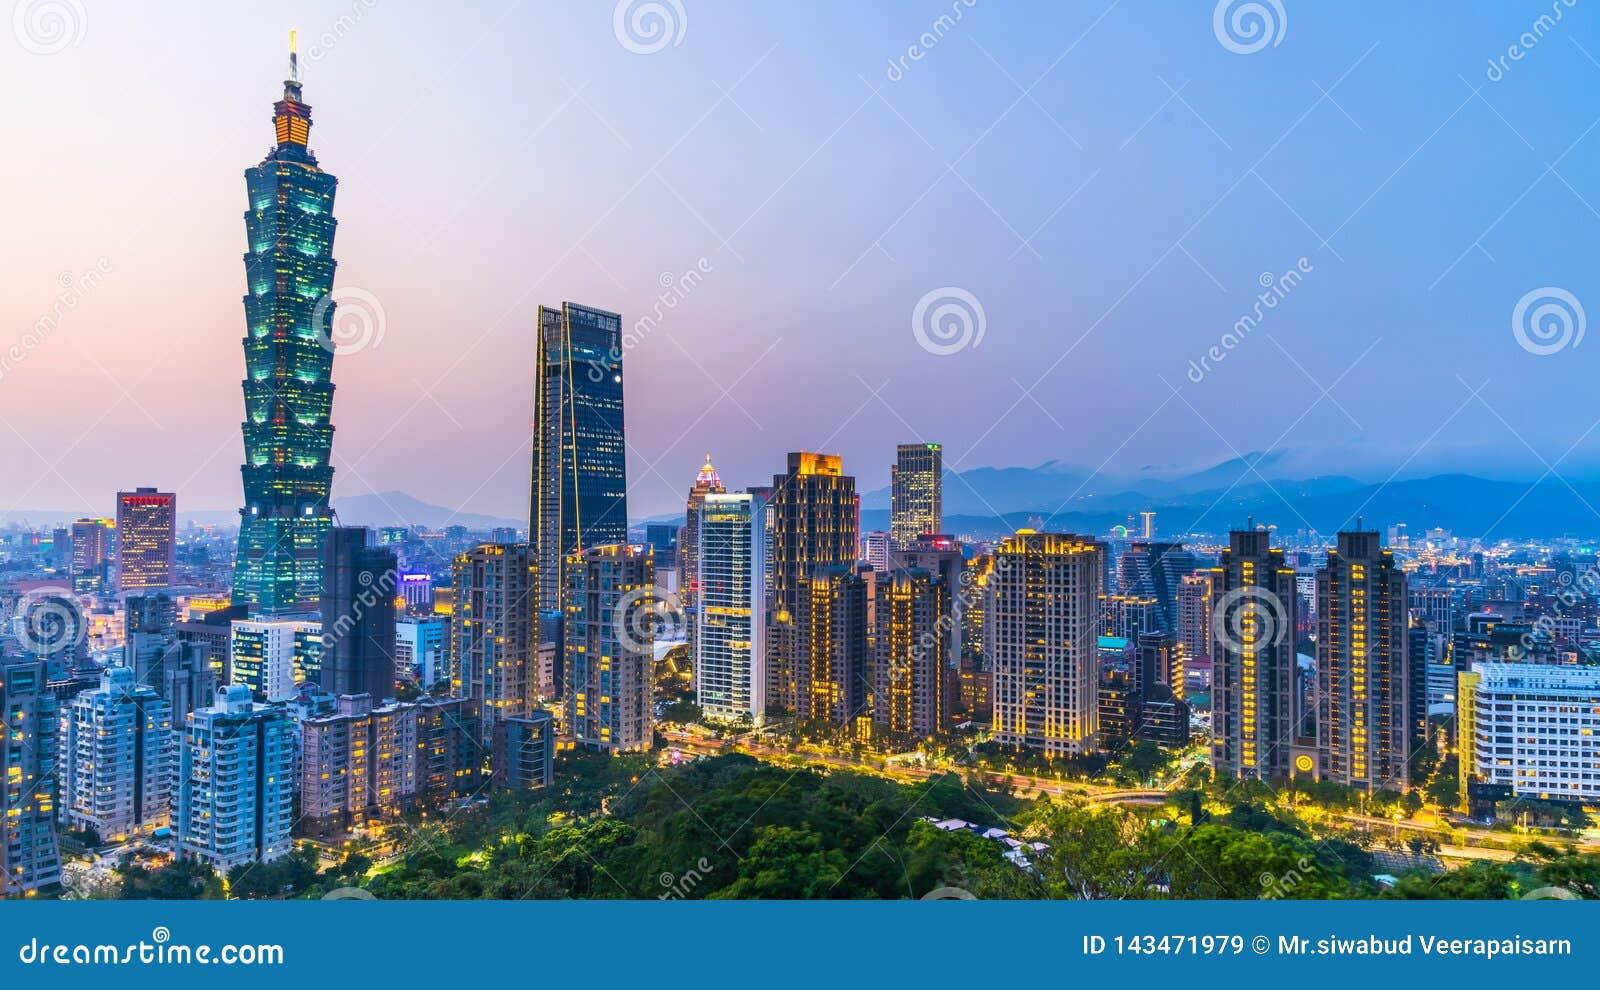 Taiwan city skyline at twilight , The beautiful sunset of Taipei, Aerial view Taiwan city skyline and skyscraper